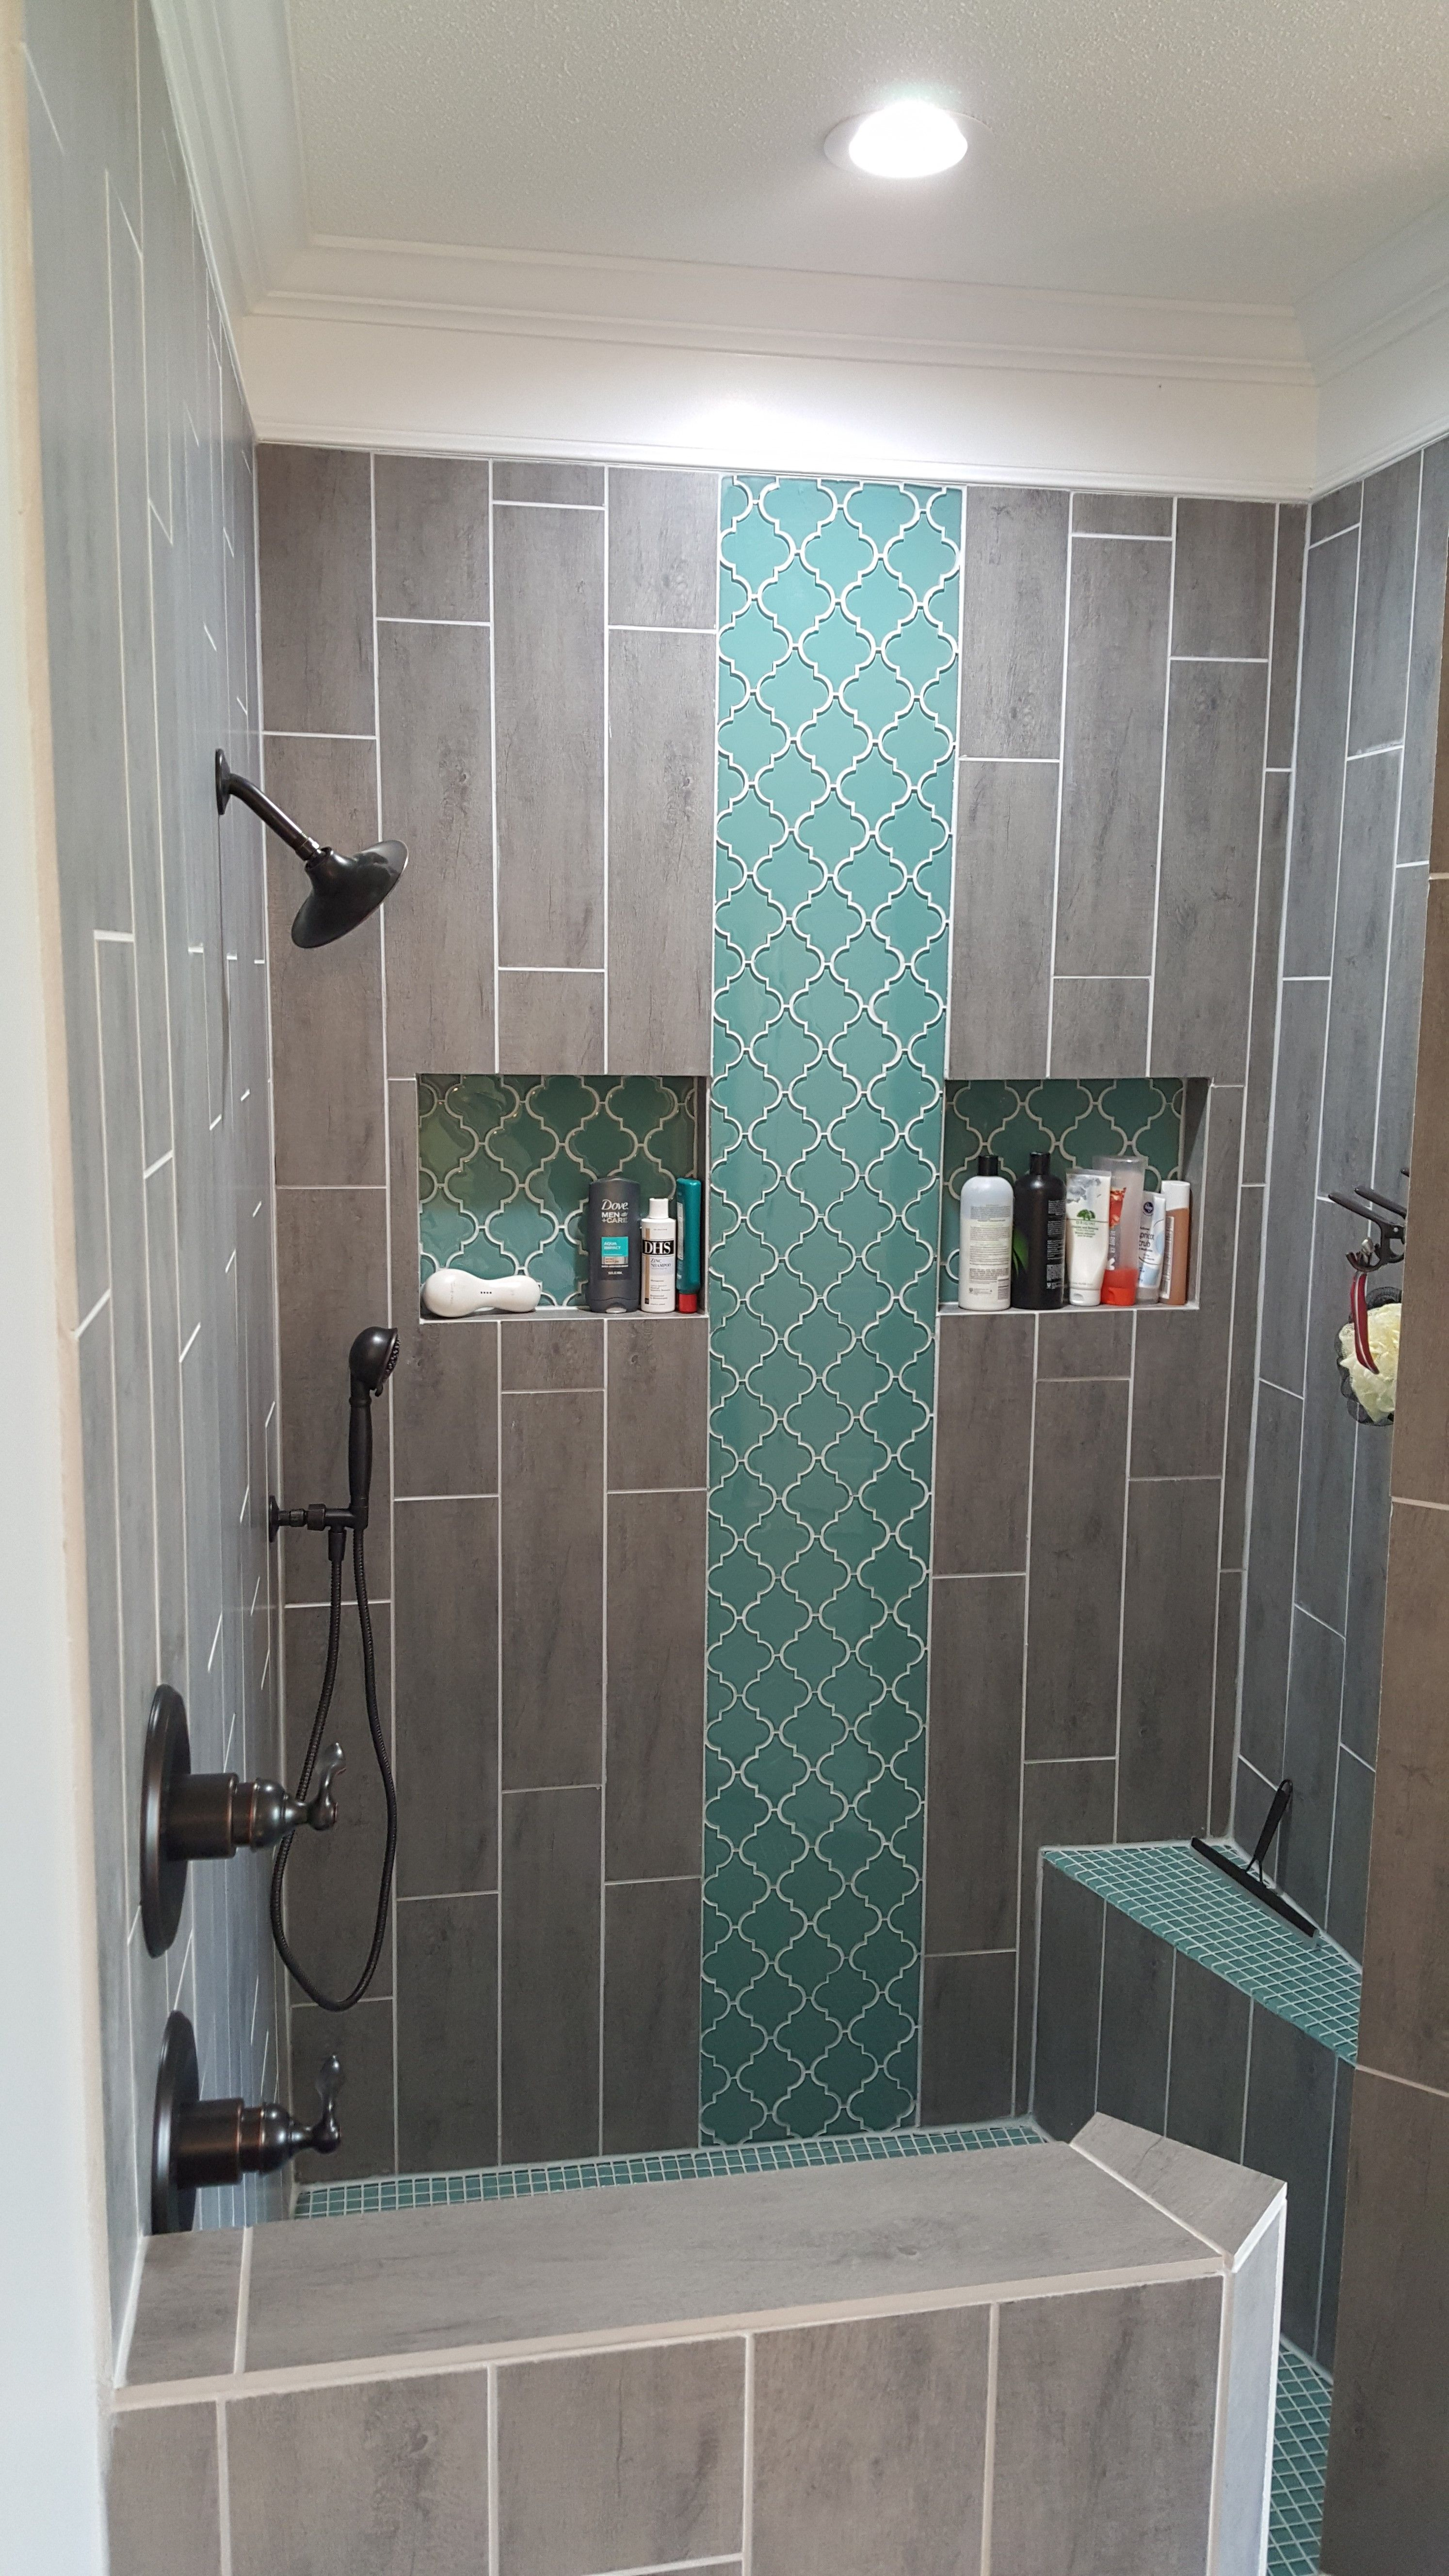 teal arabesque tile accent teal shower floor grey wood grain shower tile arabesque tile bathroom bathroom interior wood tile bathroom